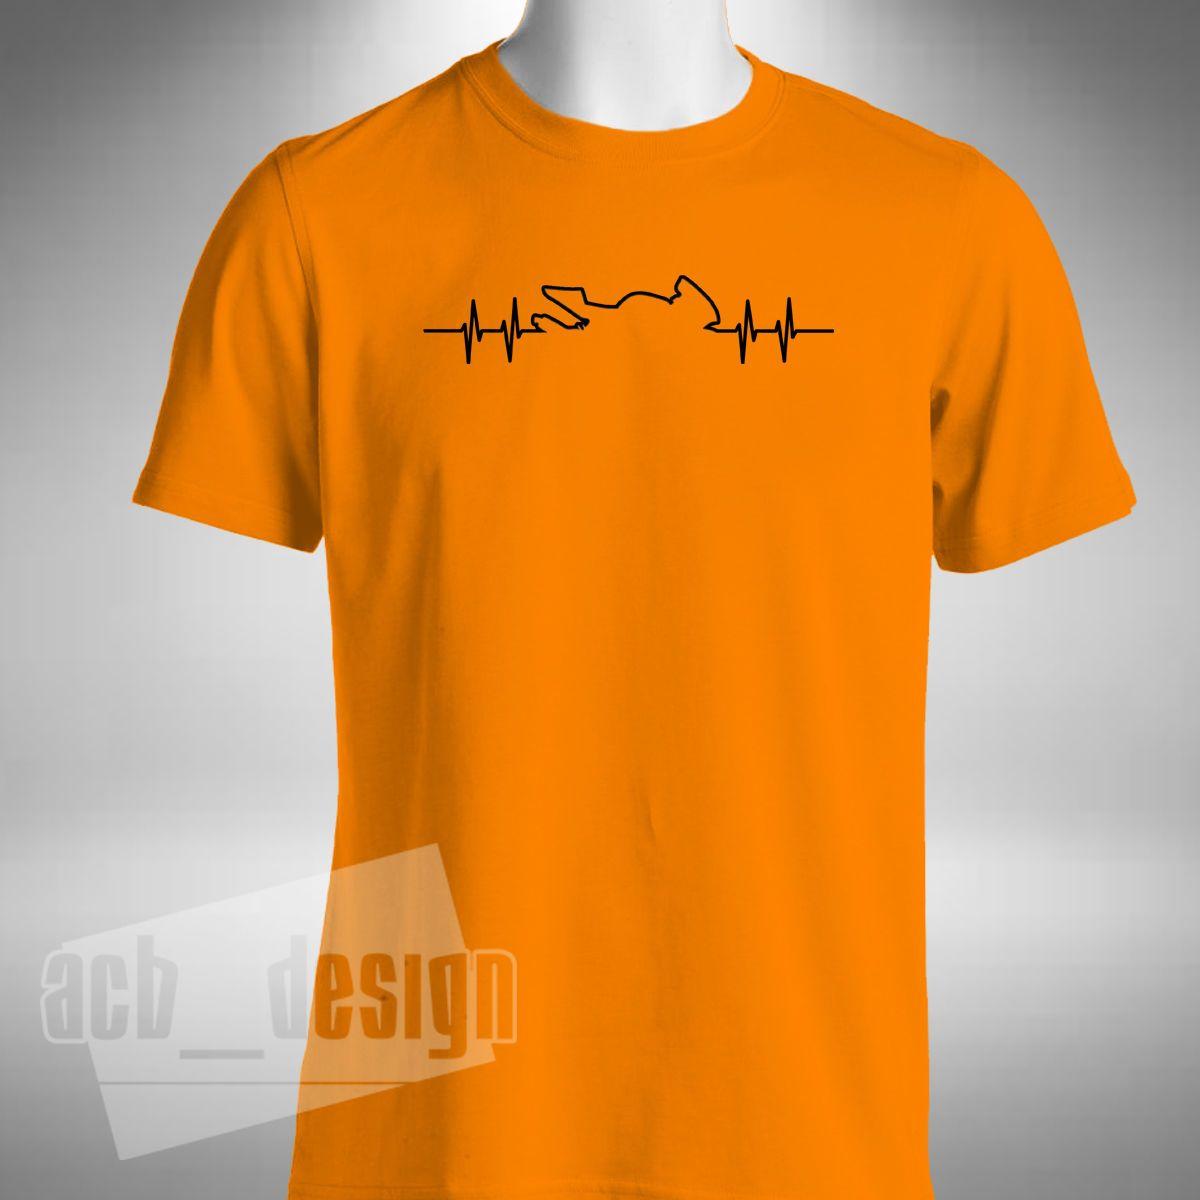 f96bd724 Bike Heartbeat Mens T Shirt Superbike Motorbike Bikes Road Bike Biker Funny  Unisex Tee Humor Shirts Offensive T Shirt From Geersfarm, $12.96  DHgate.Com